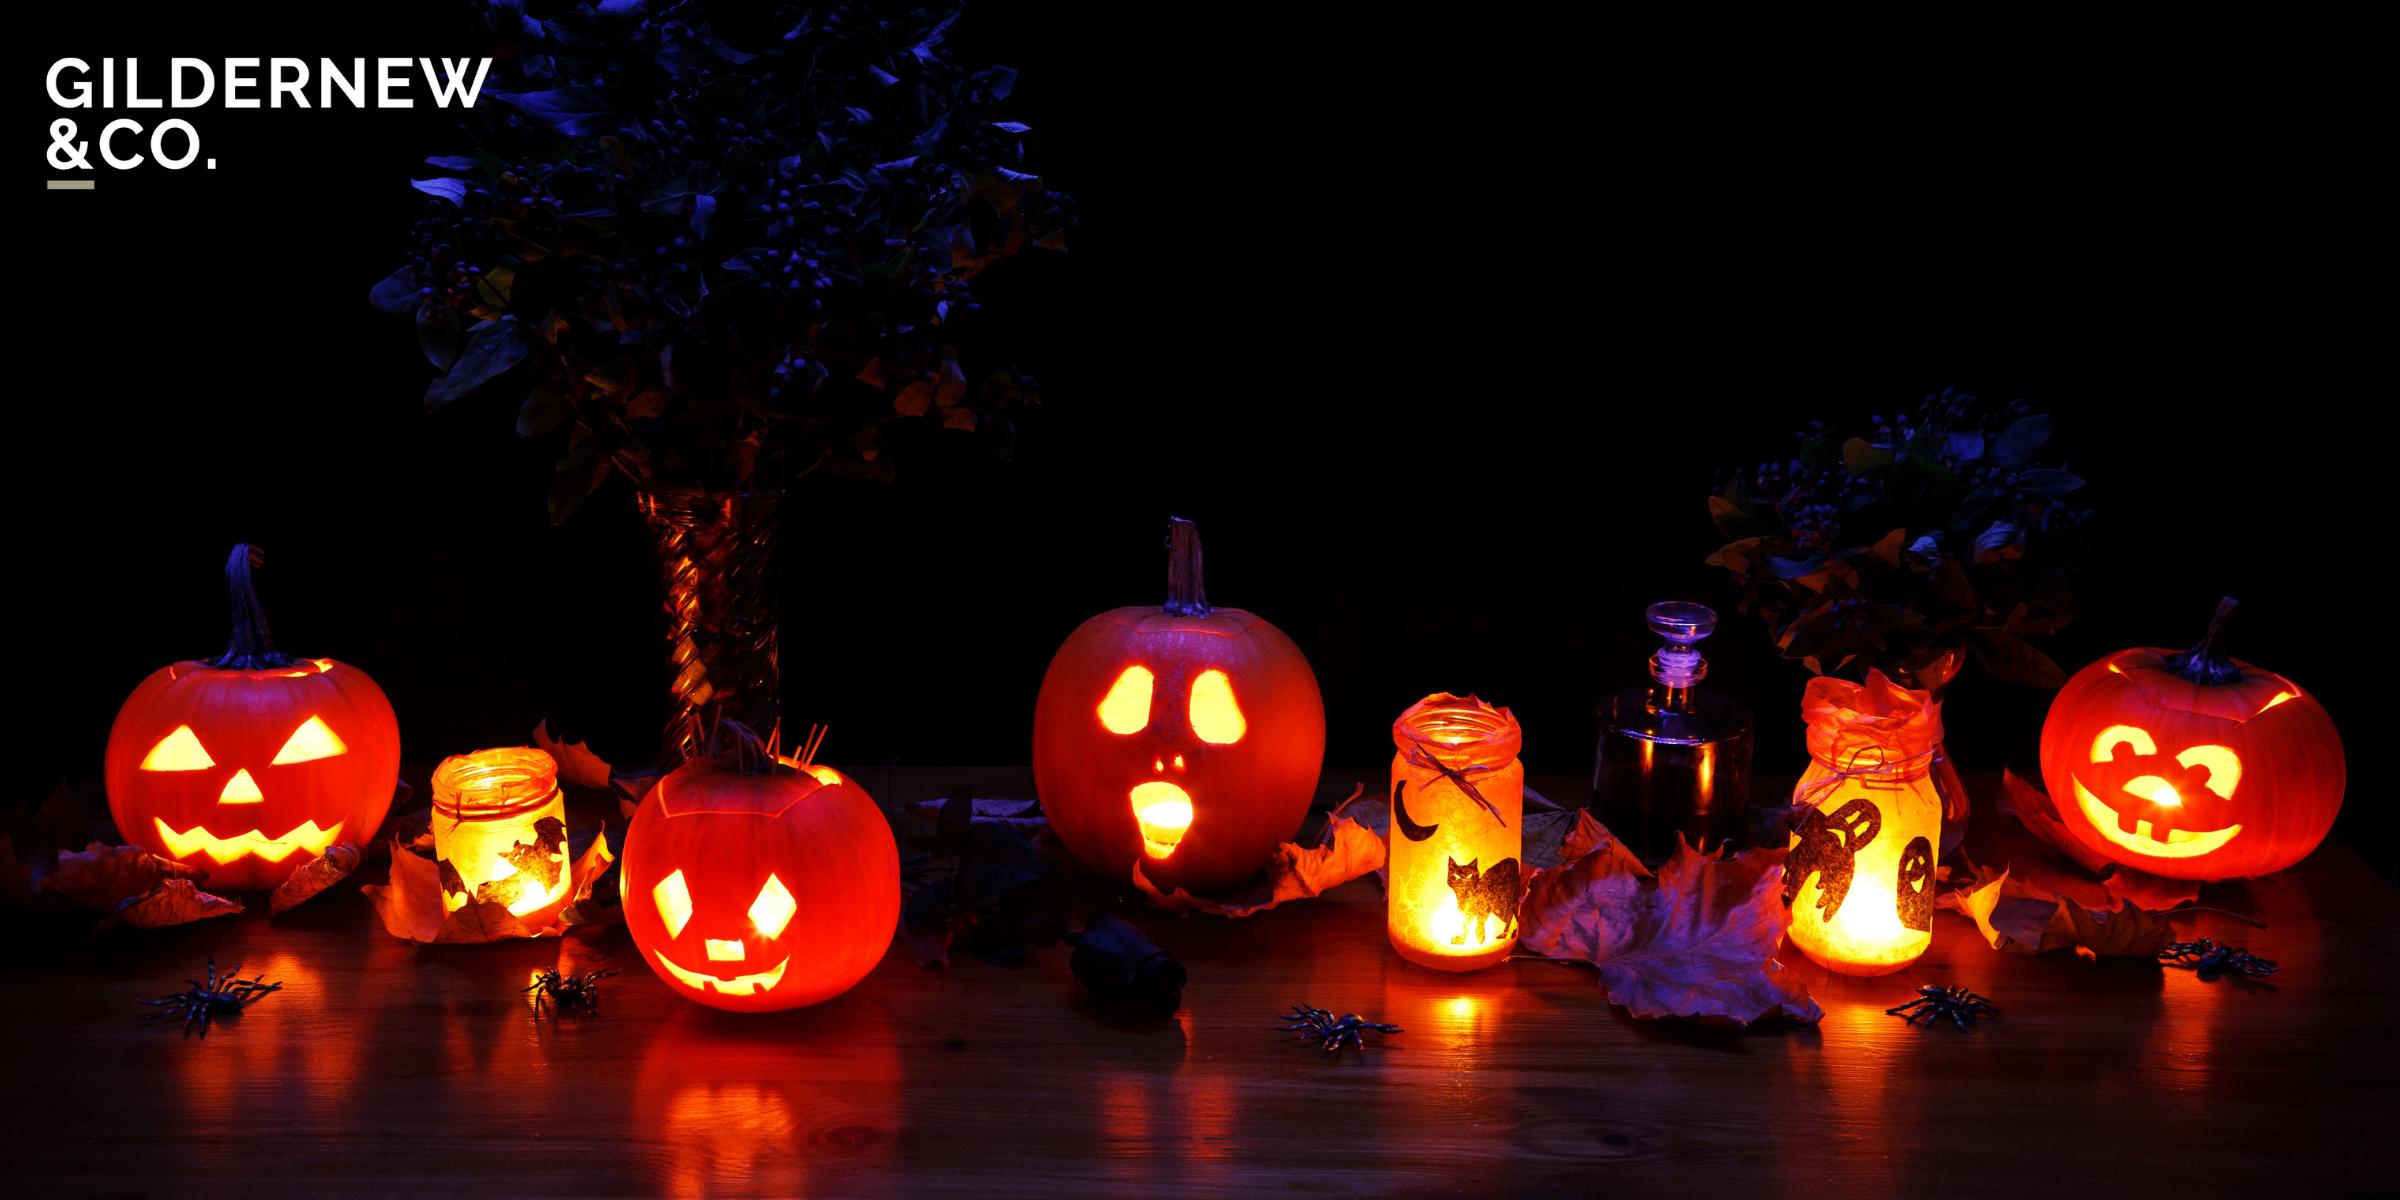 Gildernew & Co Job Support Scheme Halloween Info